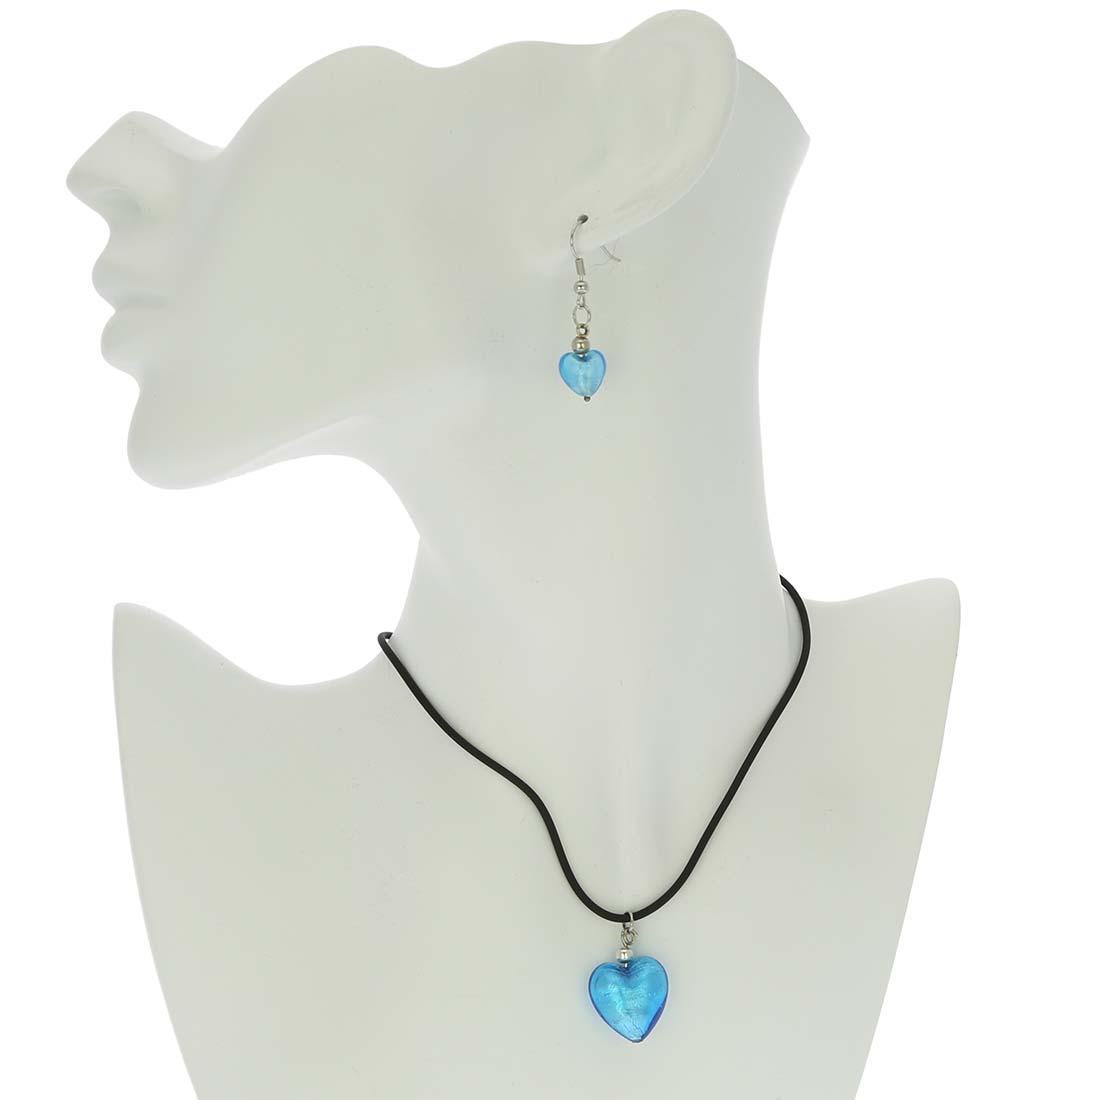 Venetian Reflections Puffed Heart Jewelry Set - Light Blue